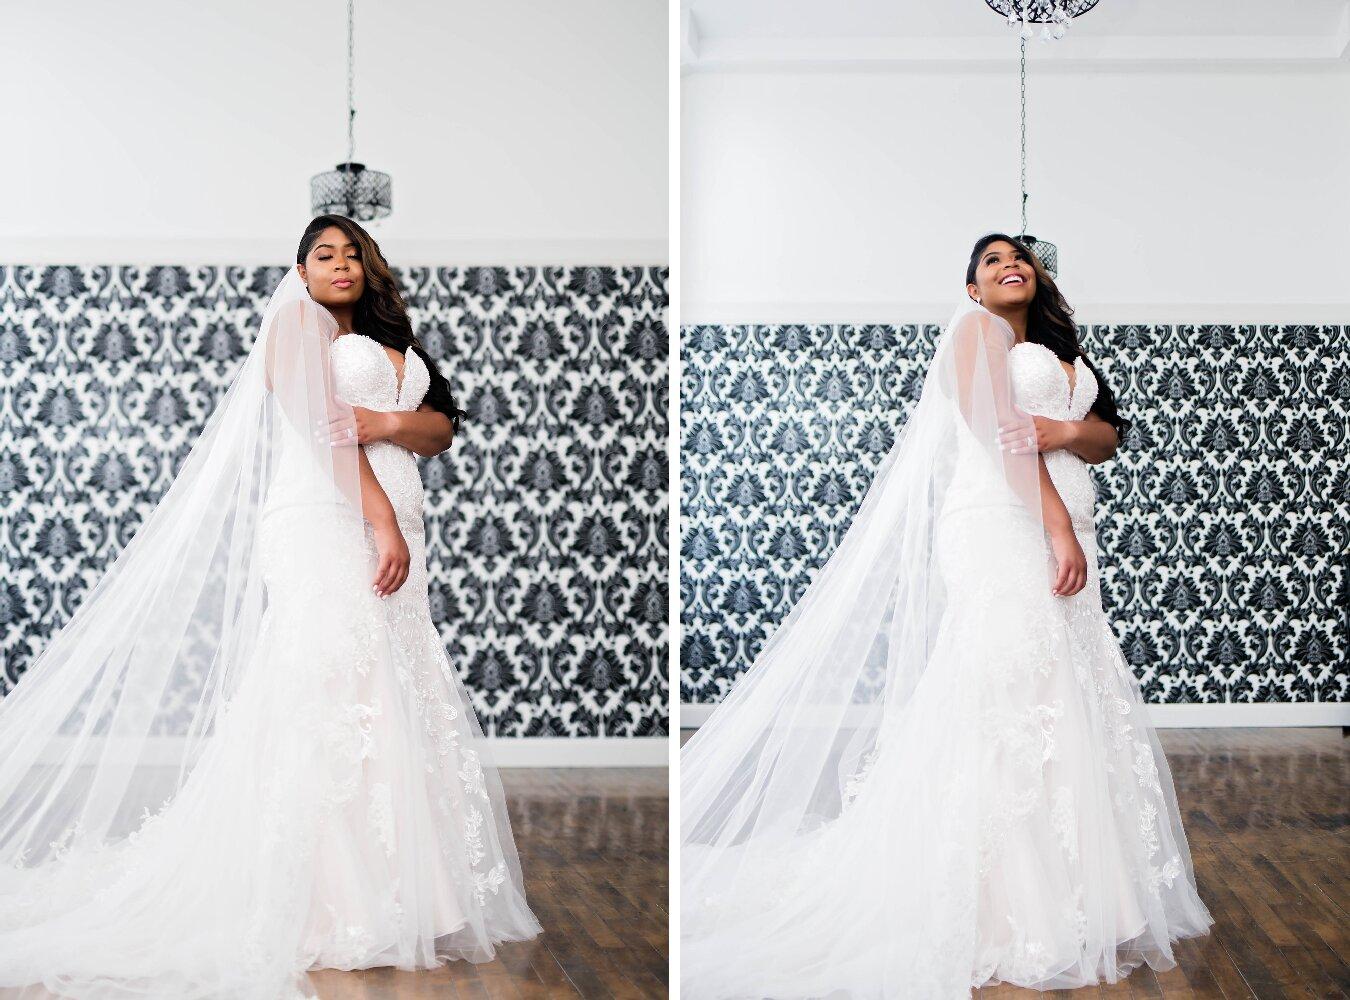 Pharris Photography- Bridal Portraits- Studio Bellas- Dallas Bride- Erica Saunders